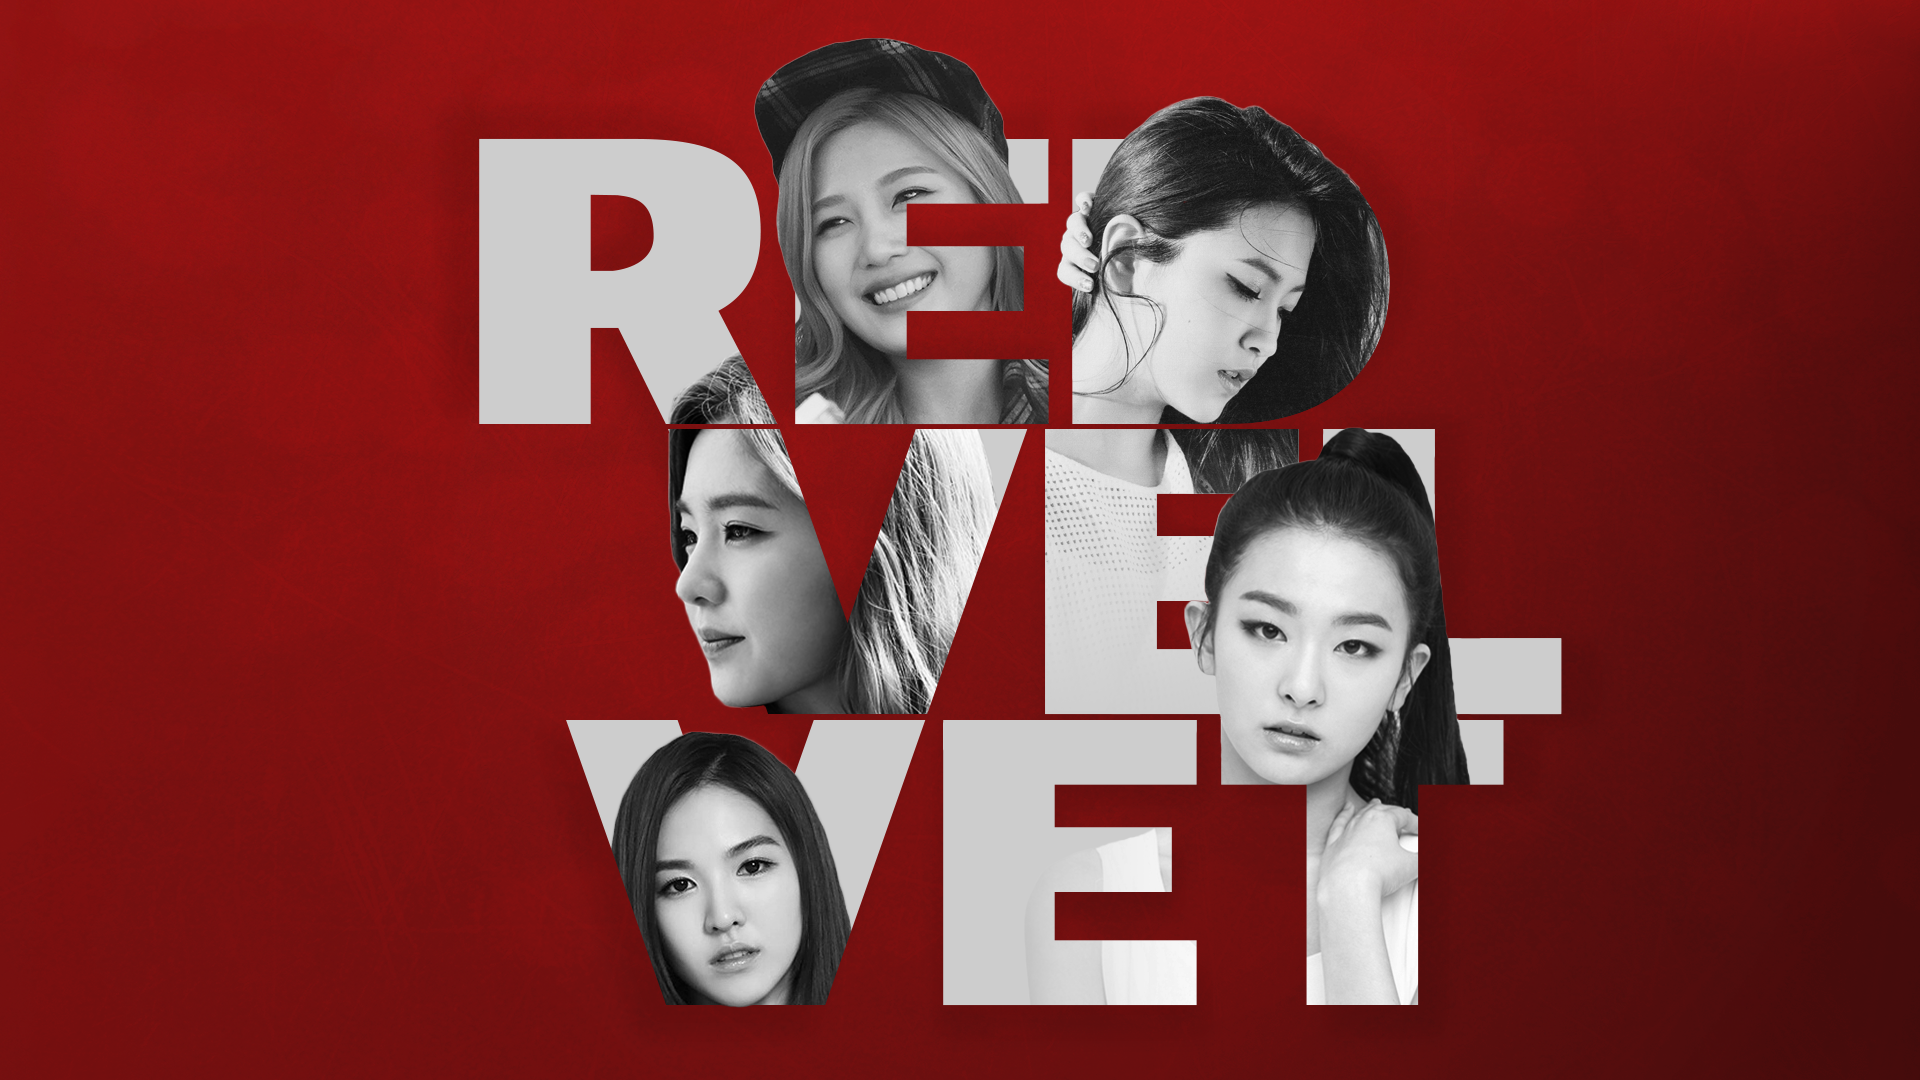 Red Velvet Wallpaper Hd 1920x1080 By Zheng Shi On Deviantart